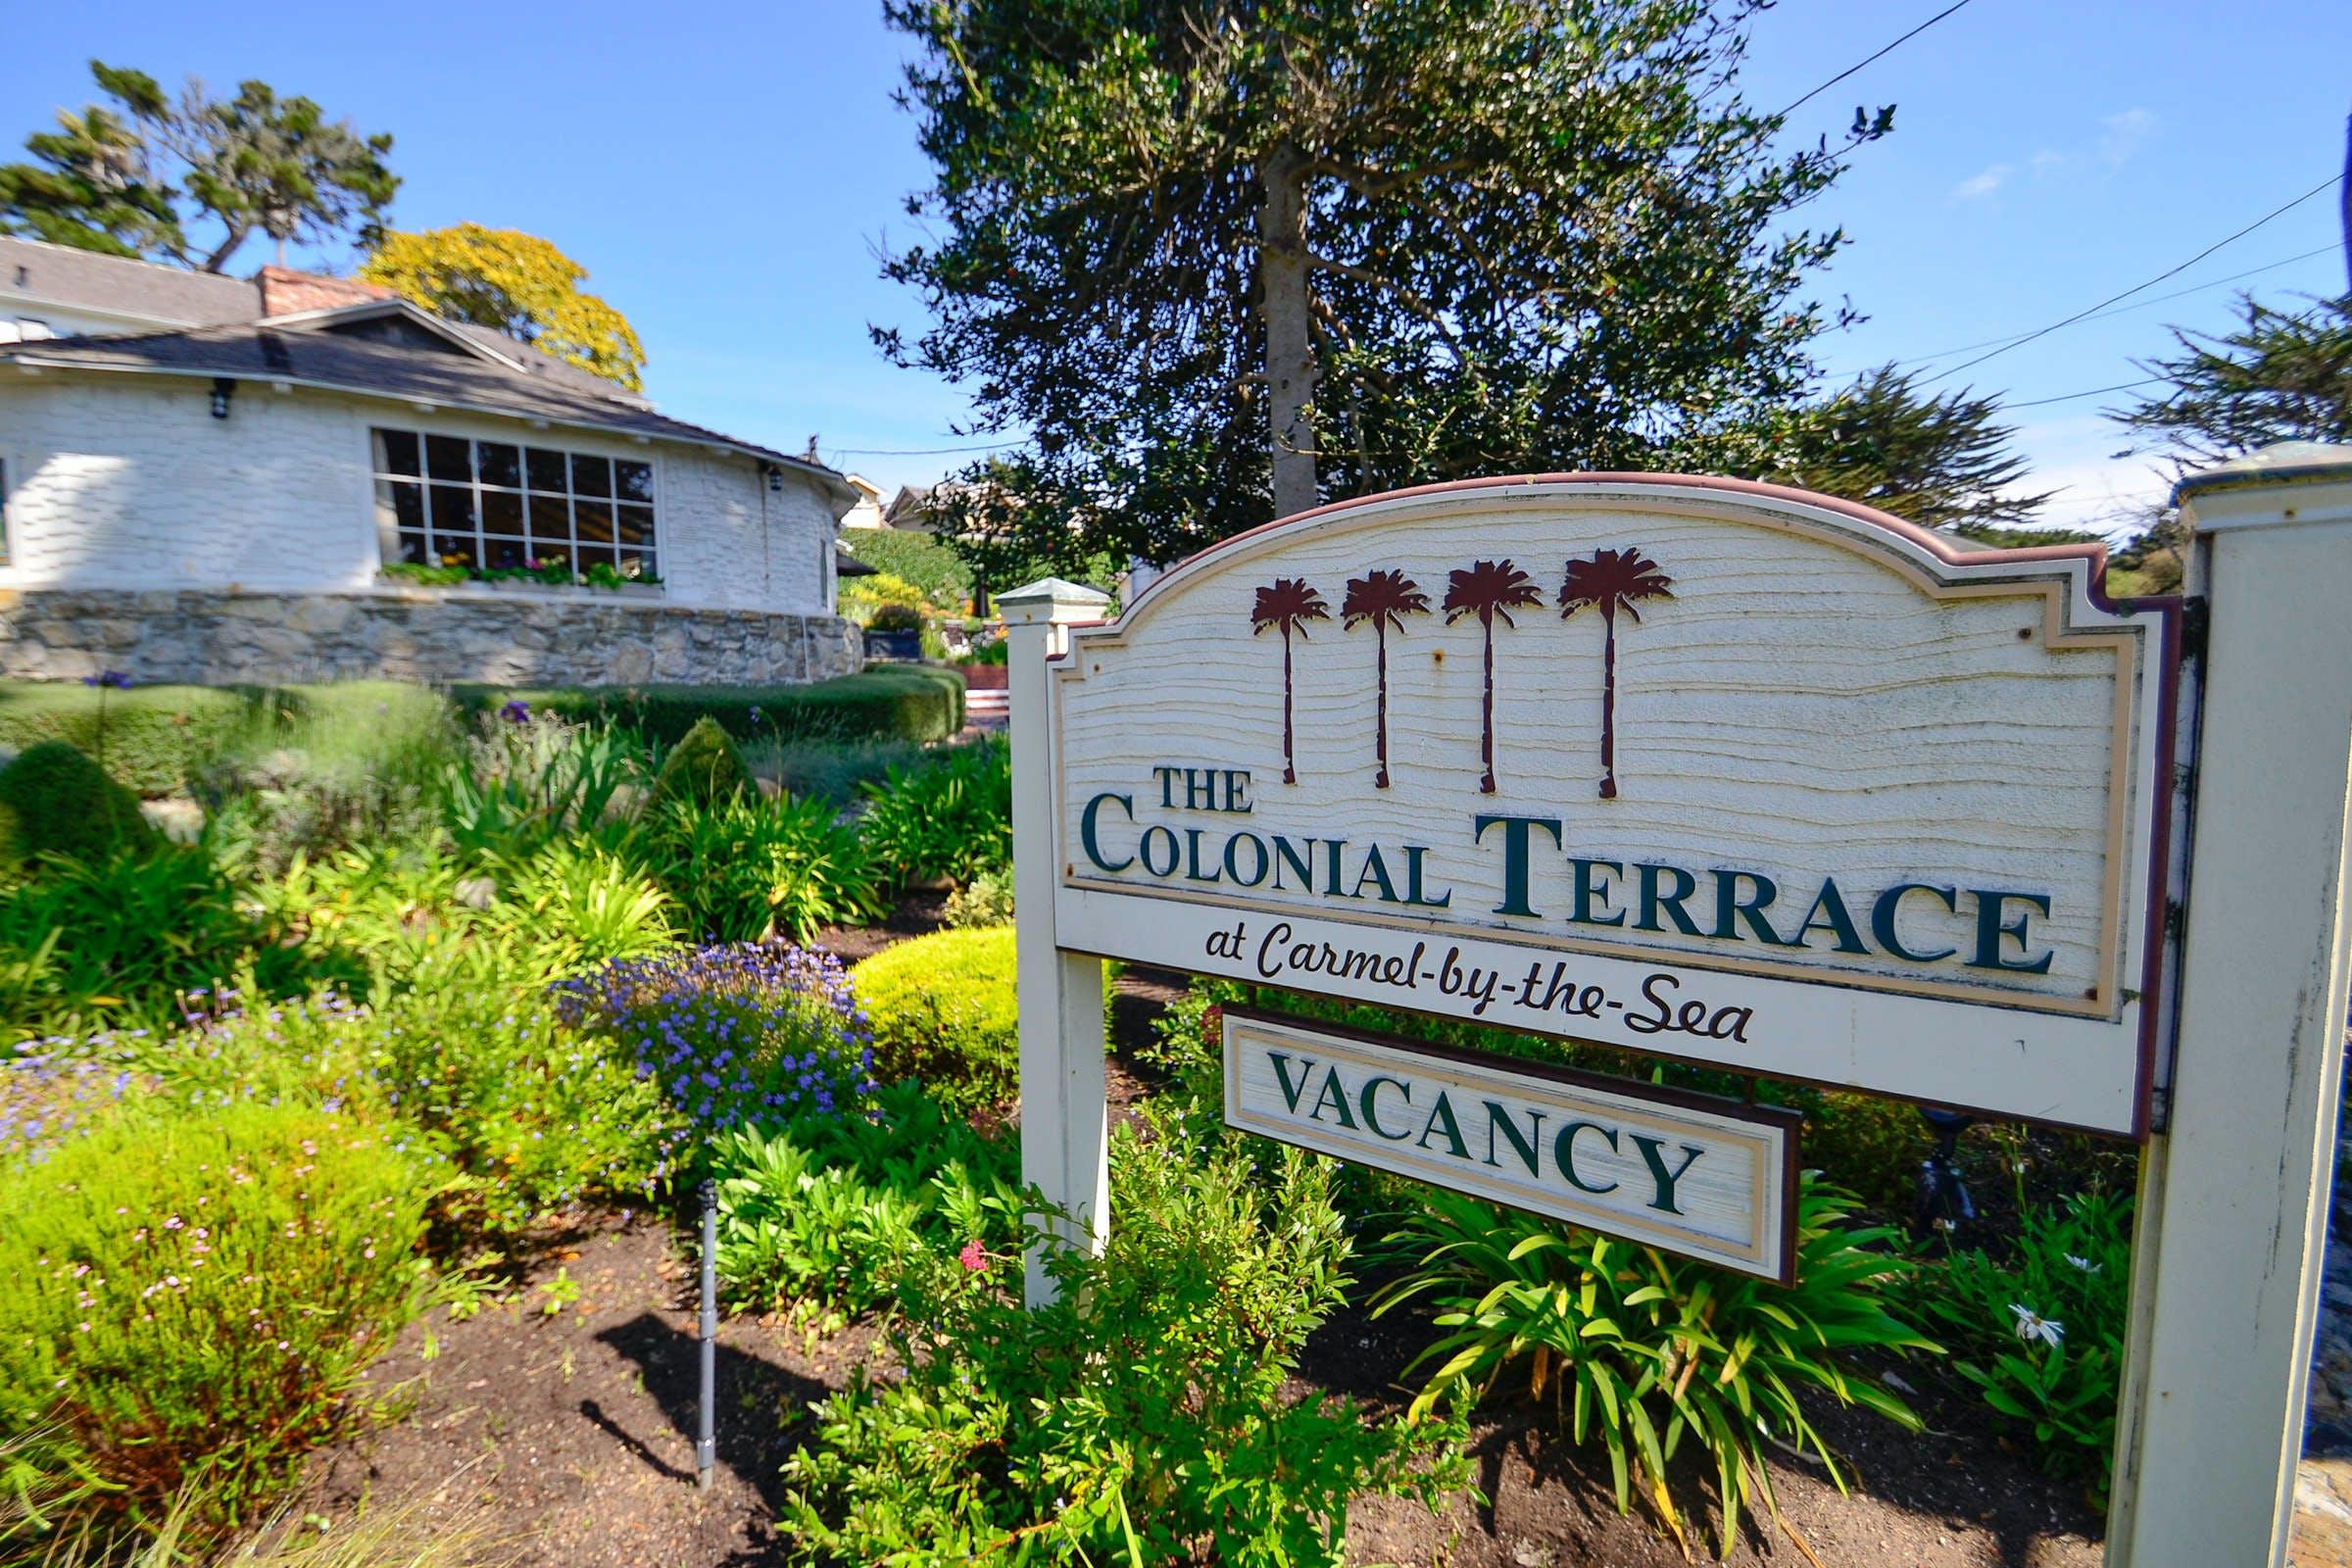 The Colonial Terrace Inn